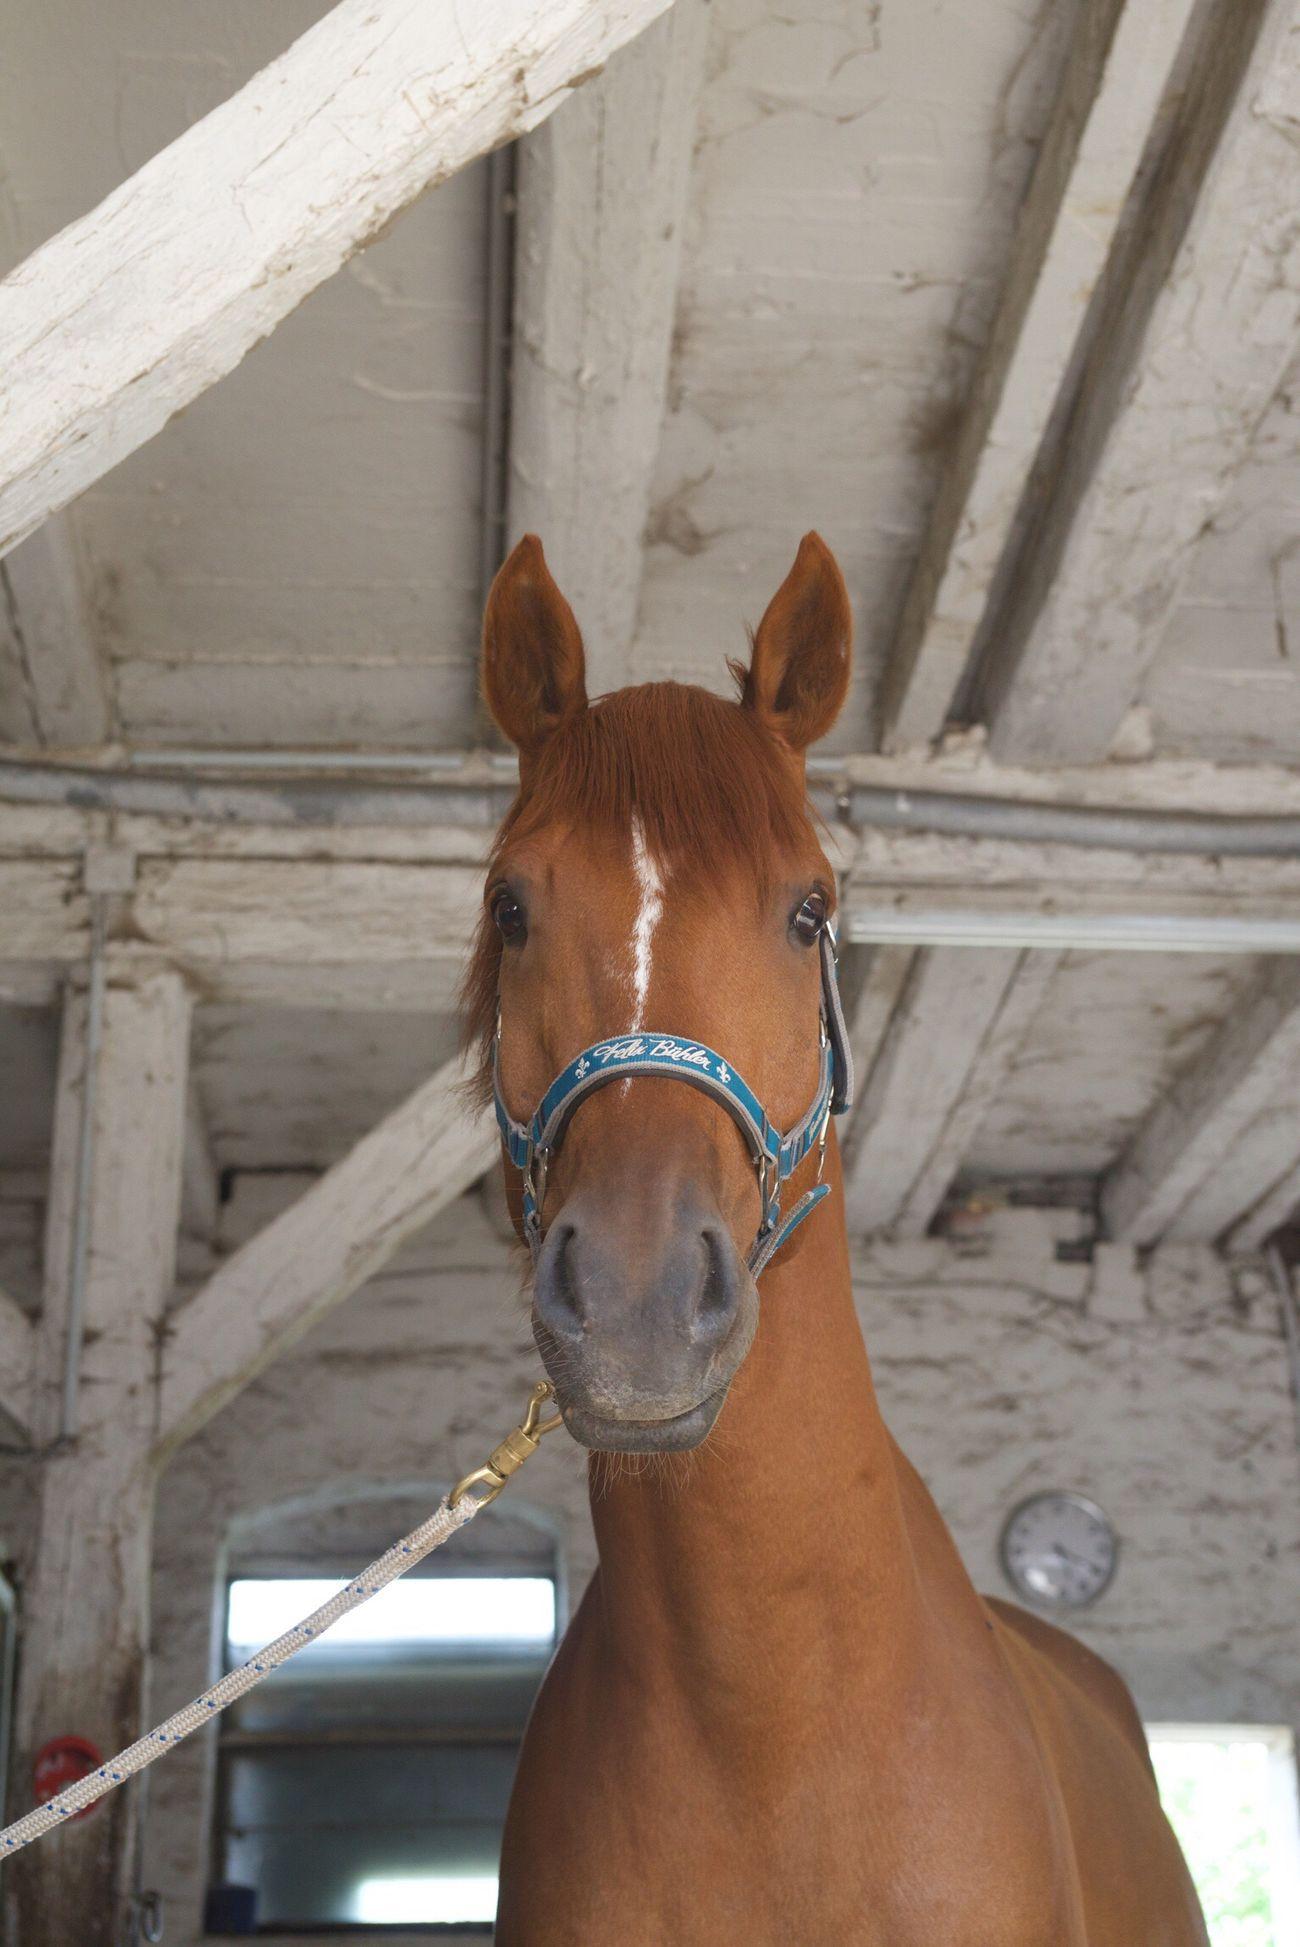 L'ami Horse Bestone